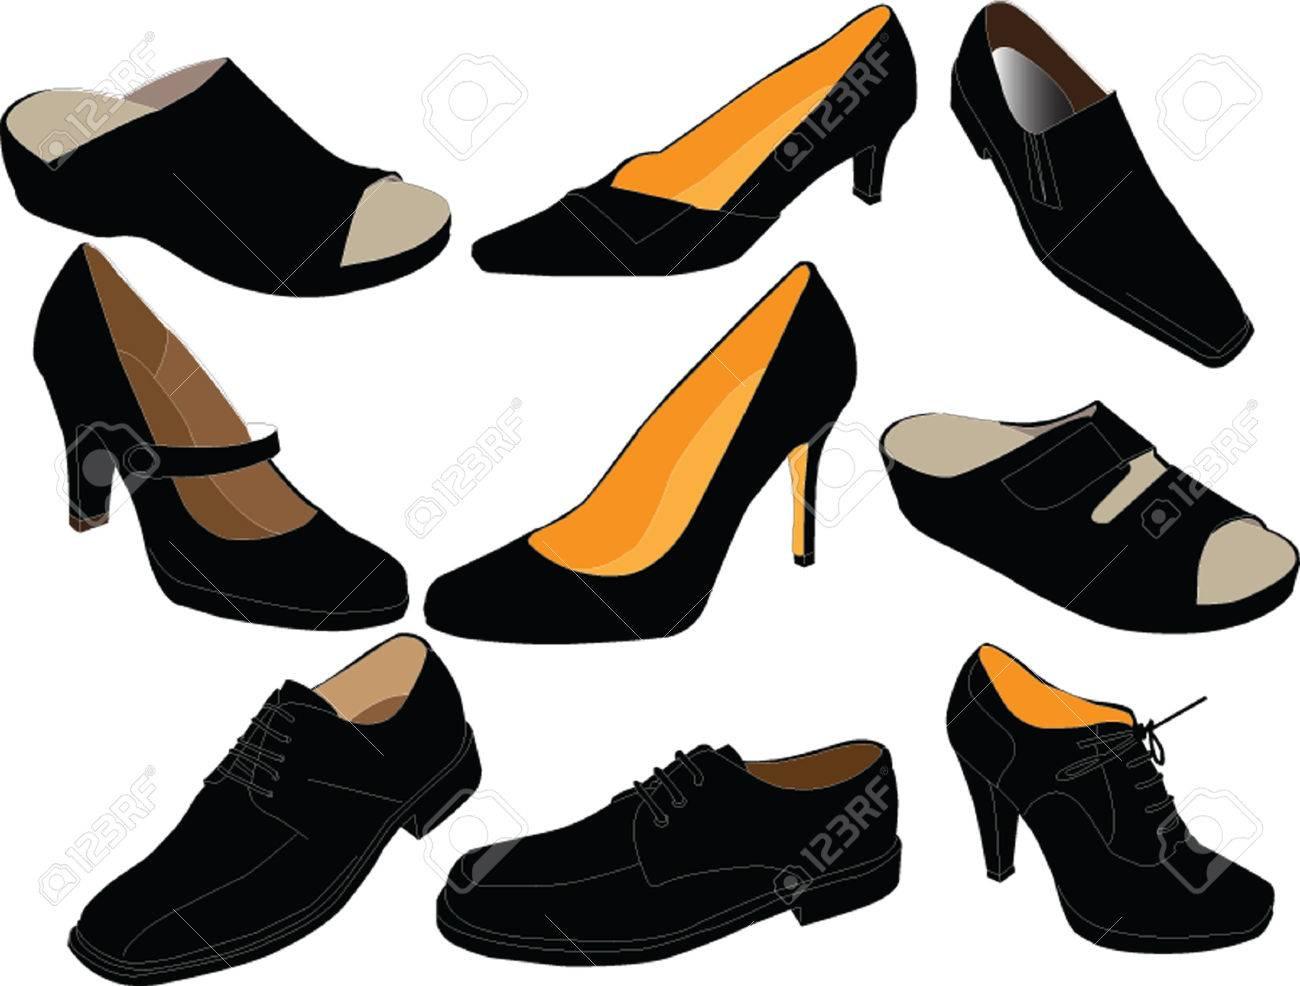 footwear collection - vector Stock Vector - 5248870